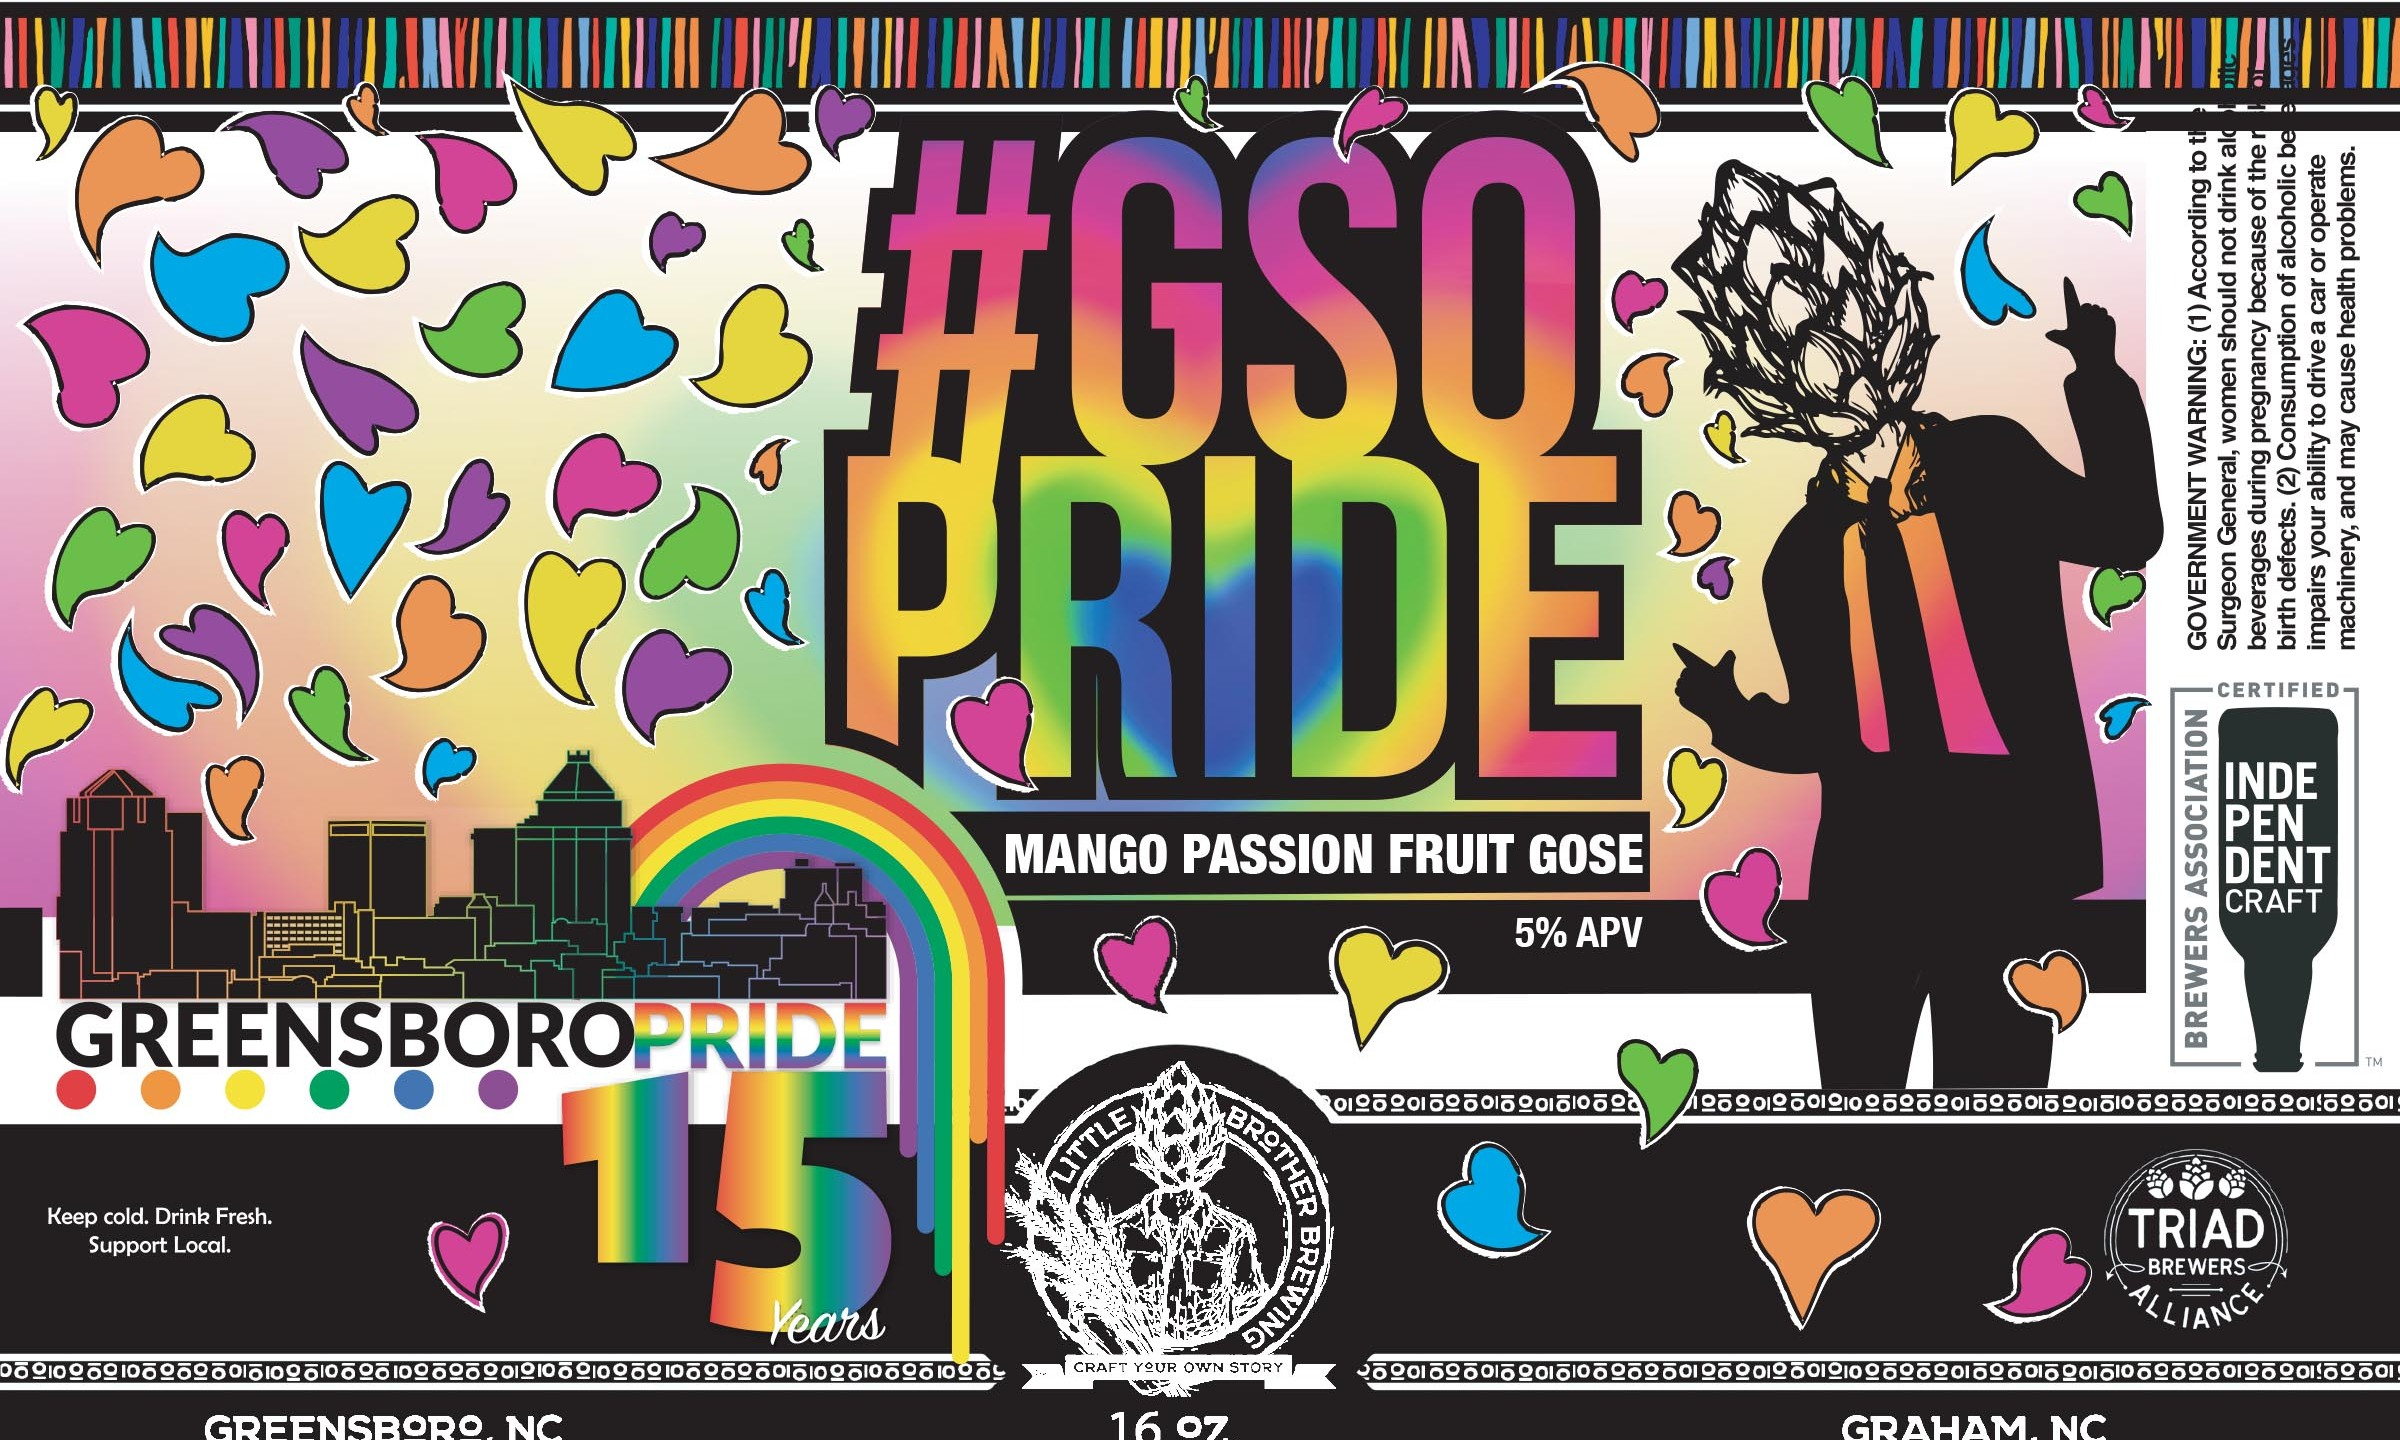 GSO Pride Beer